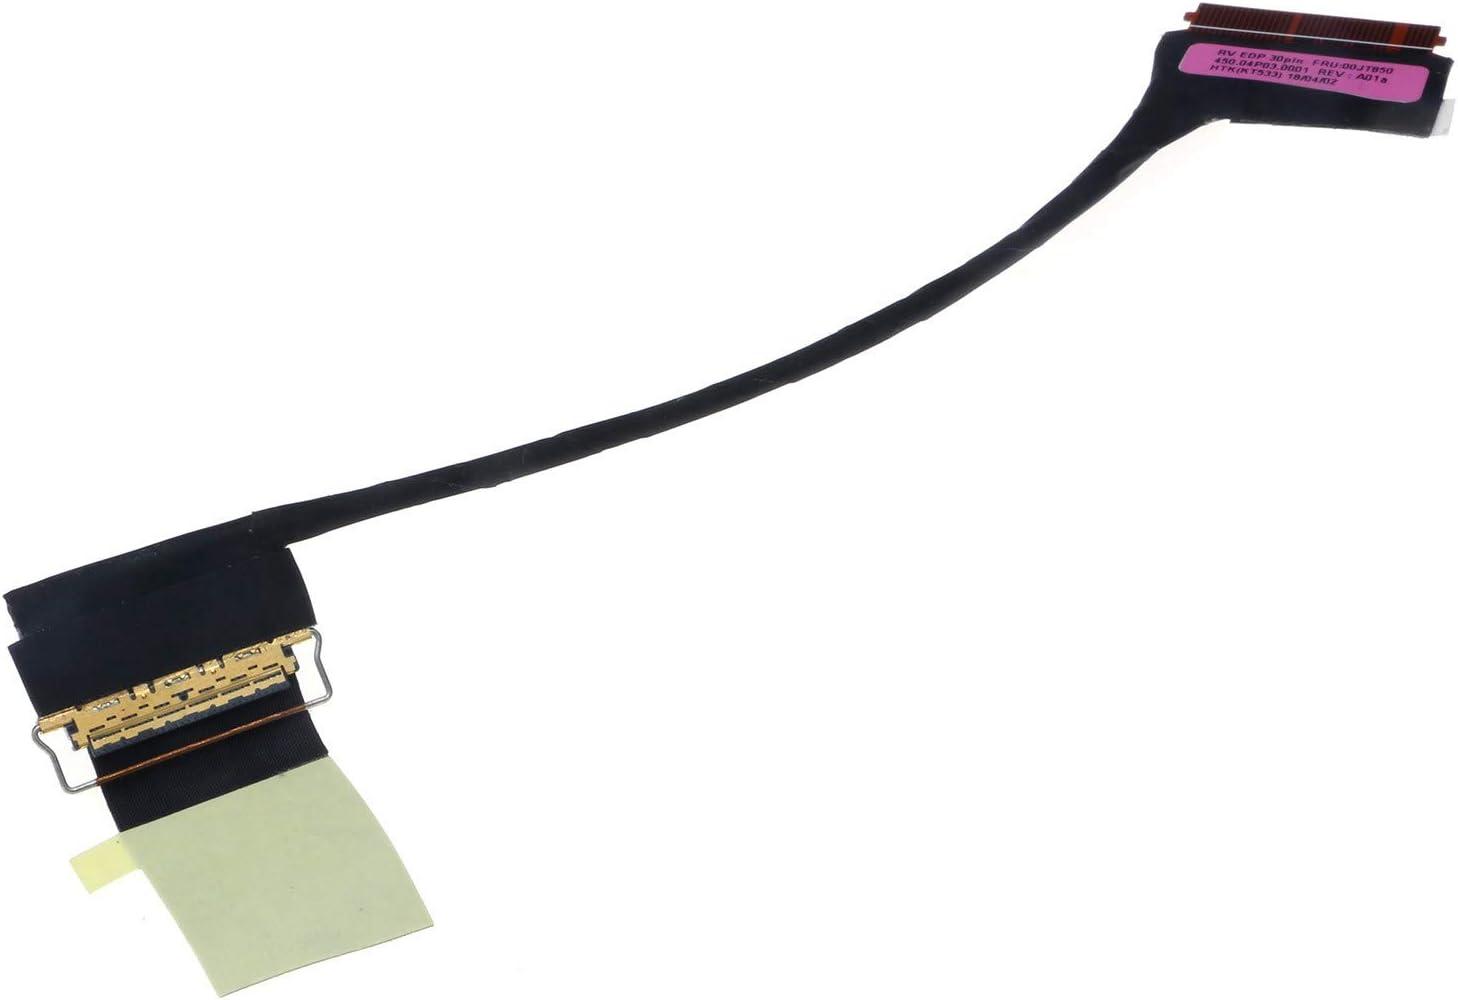 Original new for LENOVO Yoga 2 13.3 lcd Cable VIUU3 EDP cable DC02C004J00